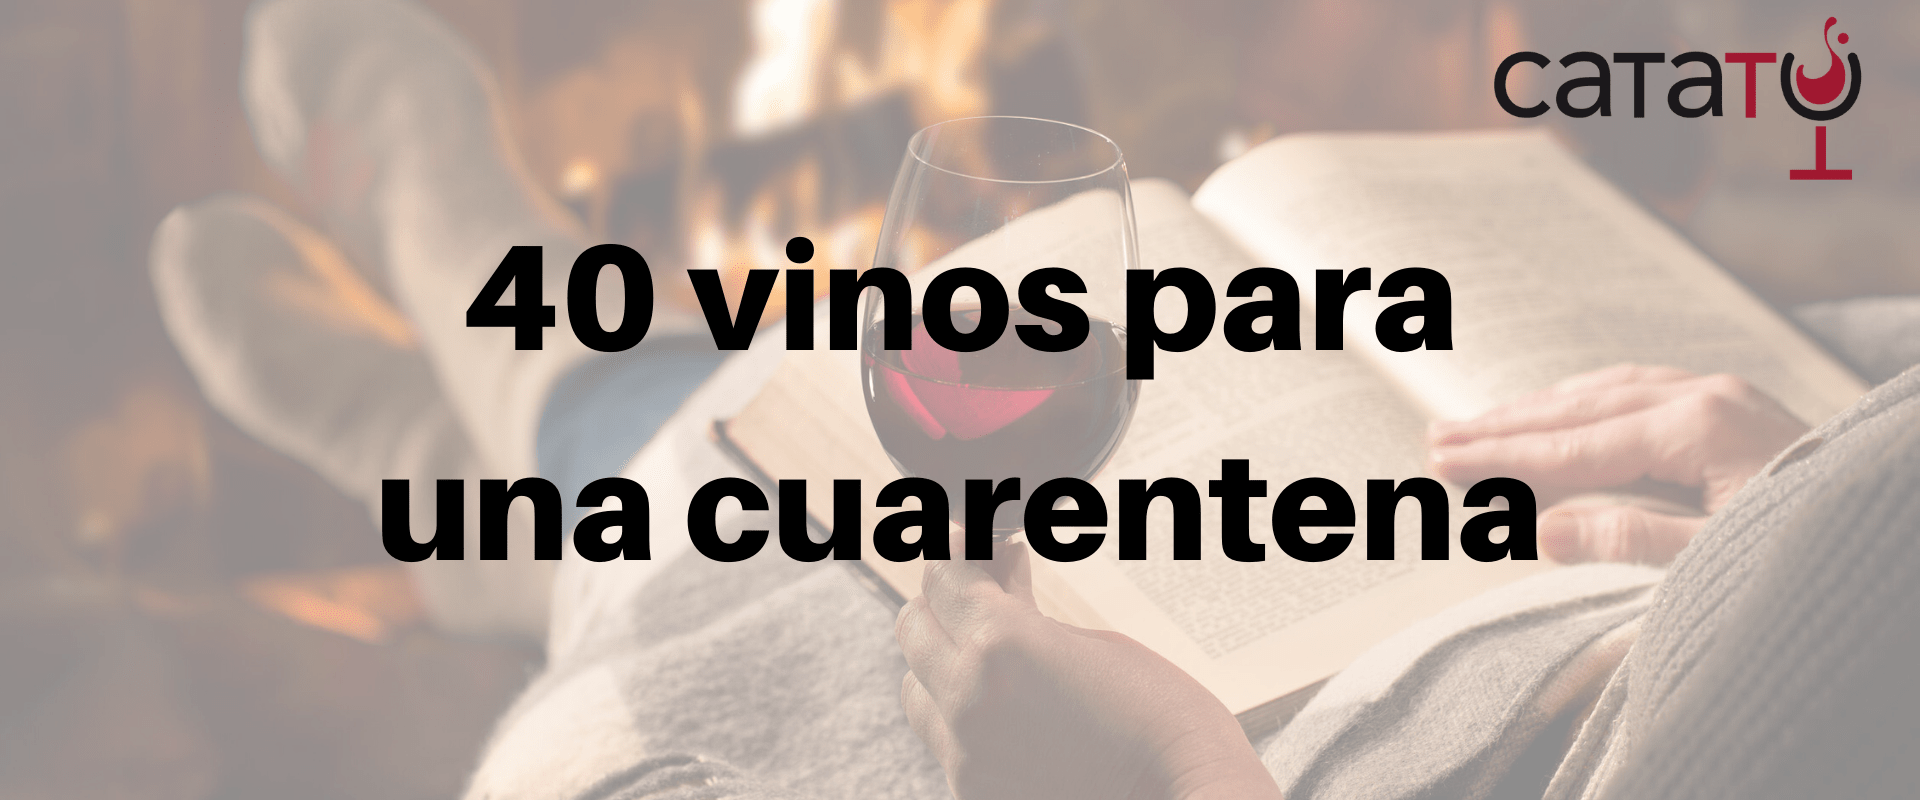 40 vinos cuarentena